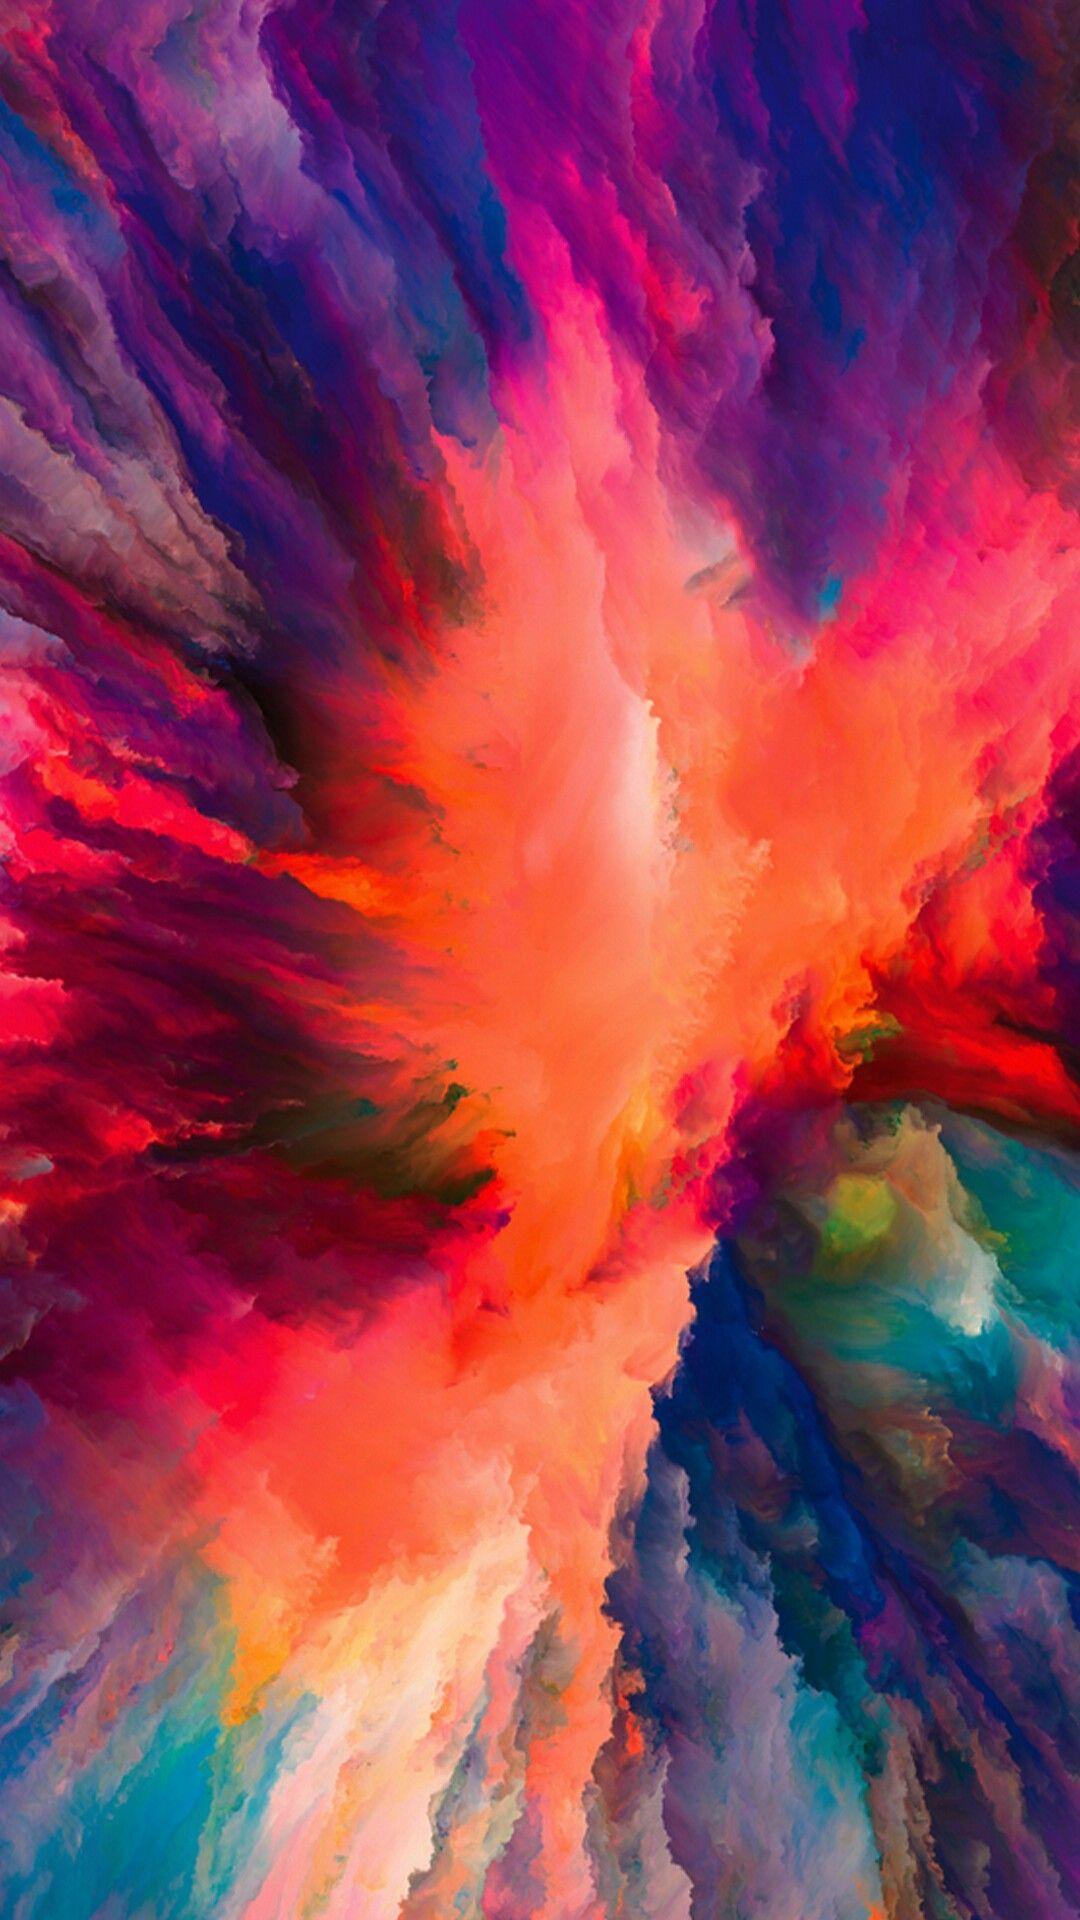 Abstract image by Iyan Sofyan on Abstract °Amoled °Liquid